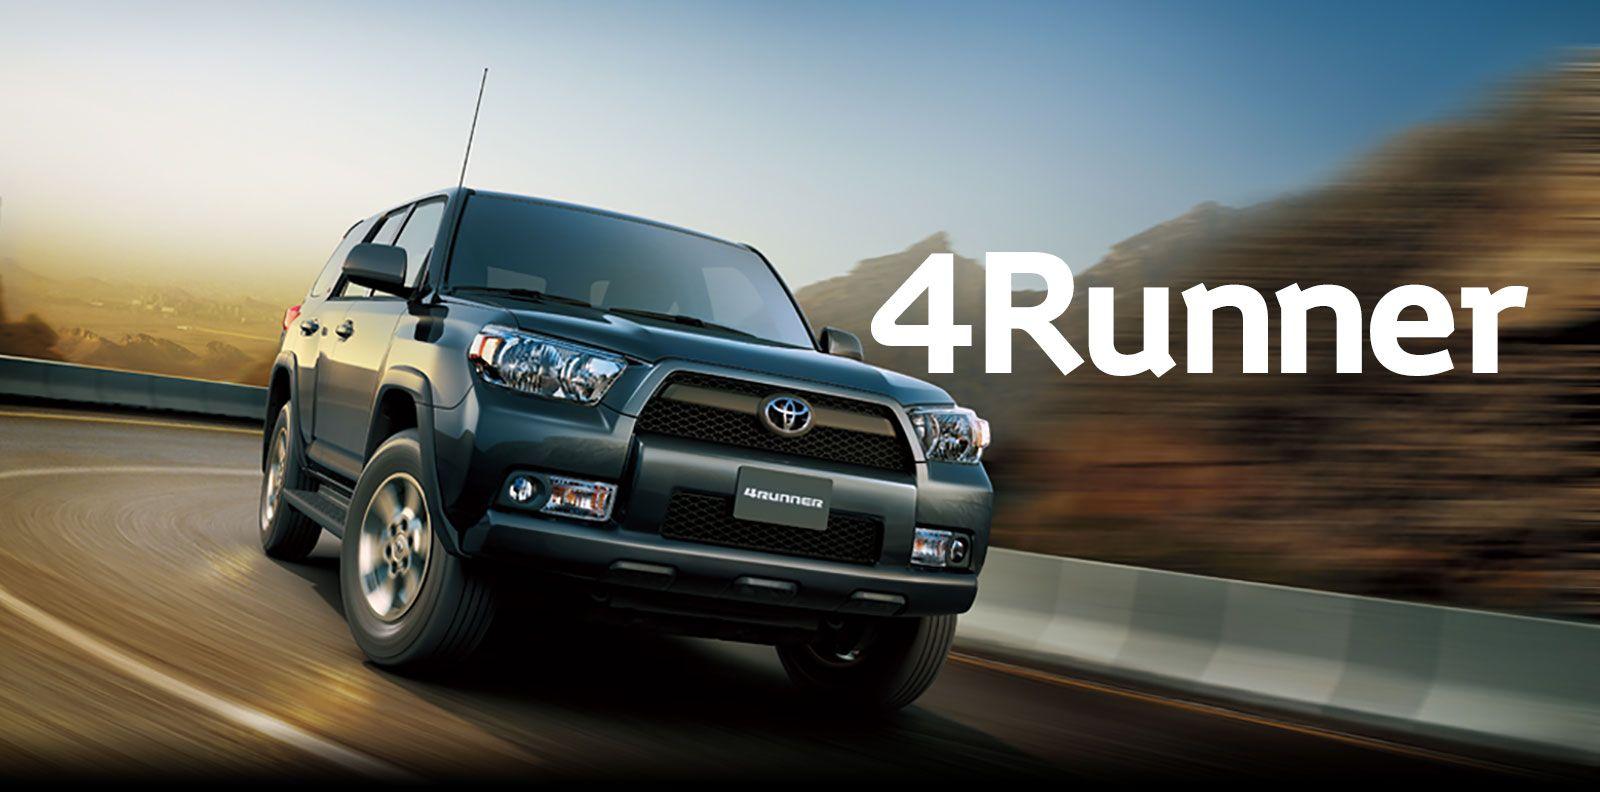 Toyota yaris 1 3 e mt 2017 philippines price amp specs autodeal - Toyota